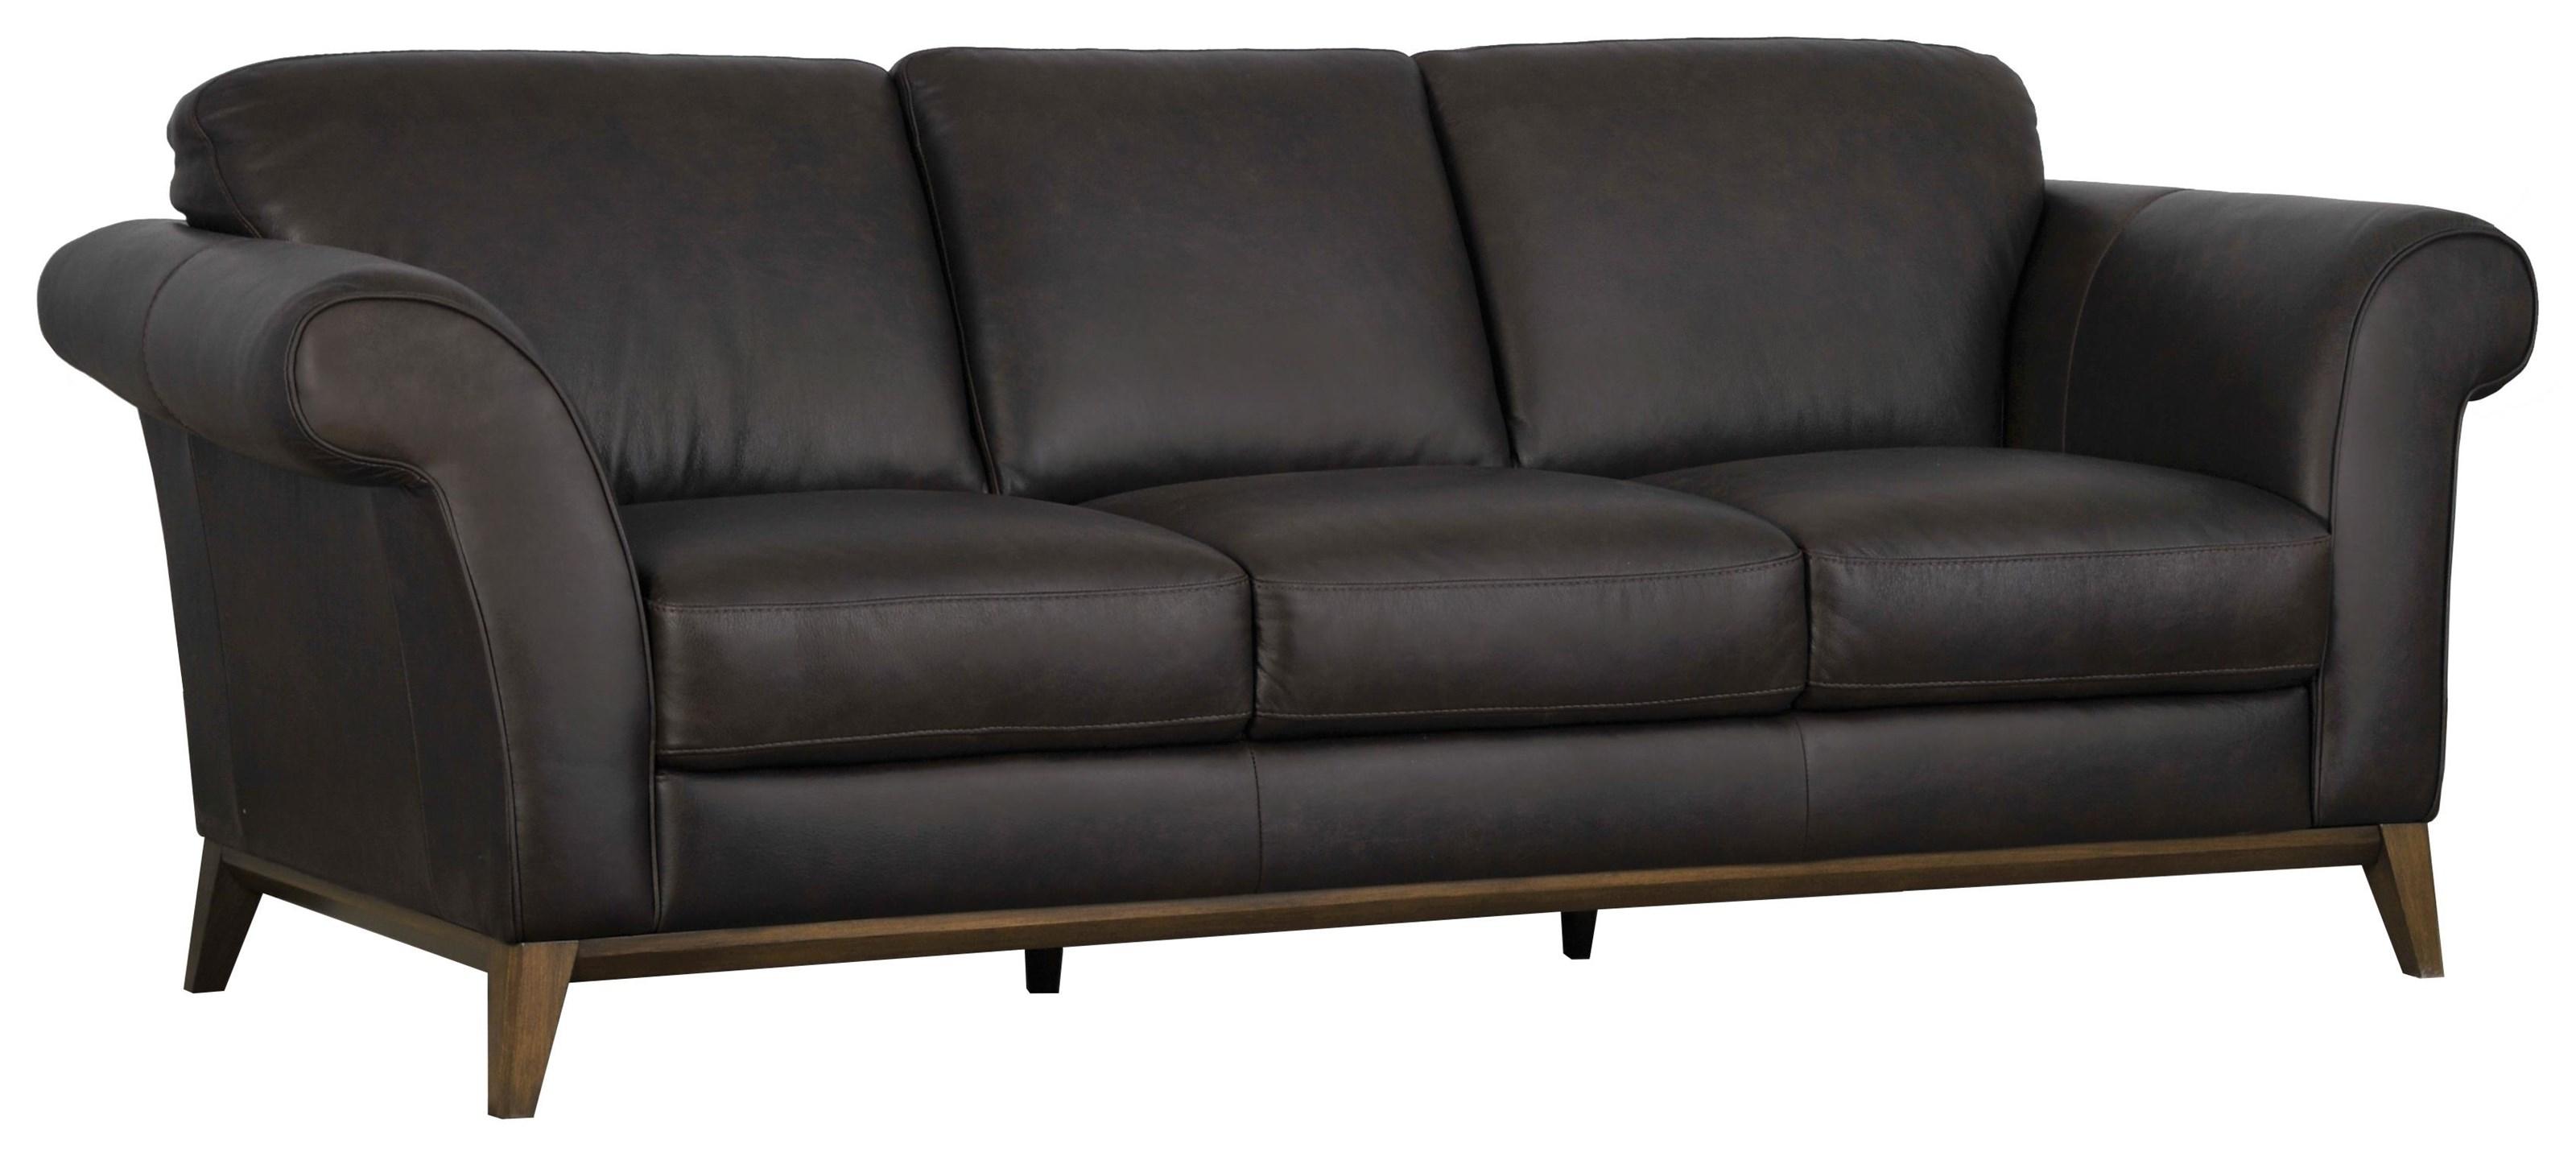 C058 Sofa by Natuzzi Editions at Williams & Kay